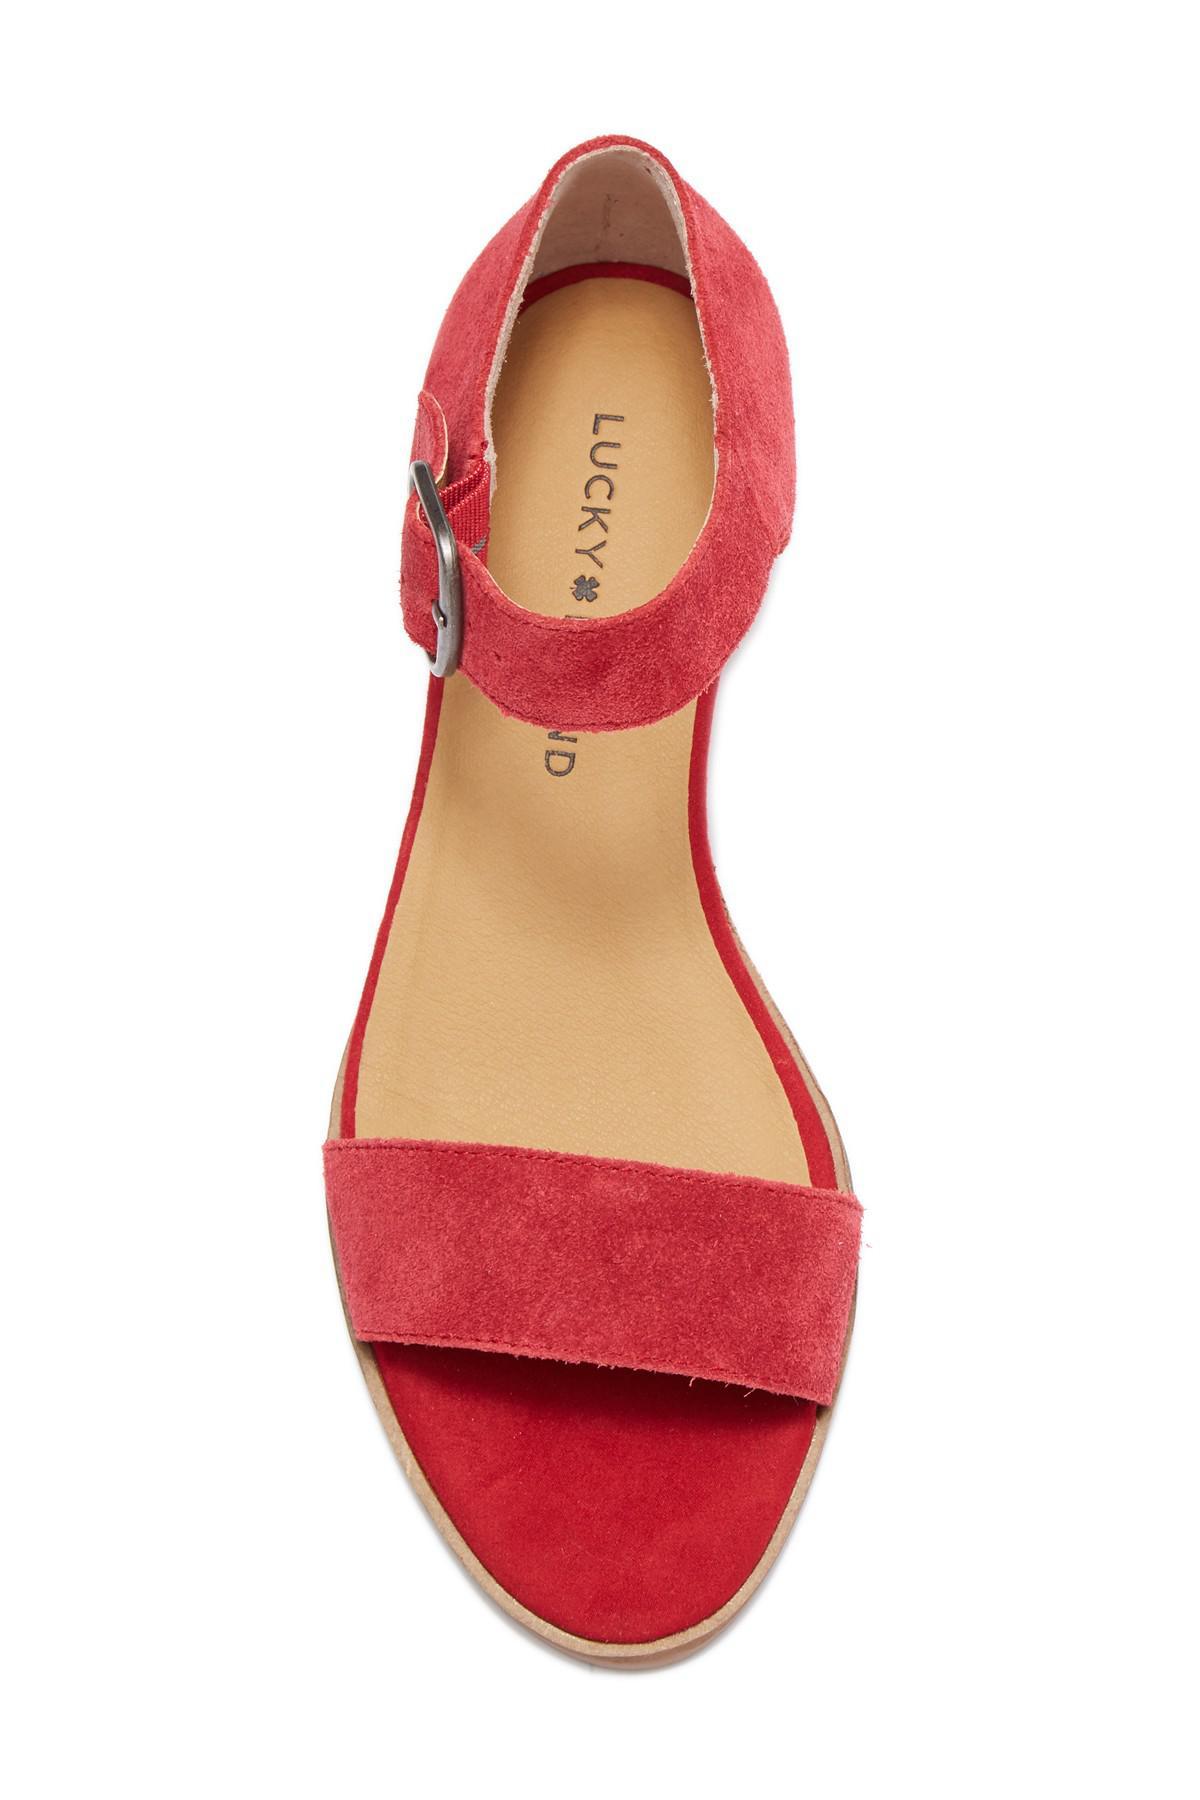 5e7b858a2b2 Lyst - Lucky Brand Renzee Platform Sandal in Red